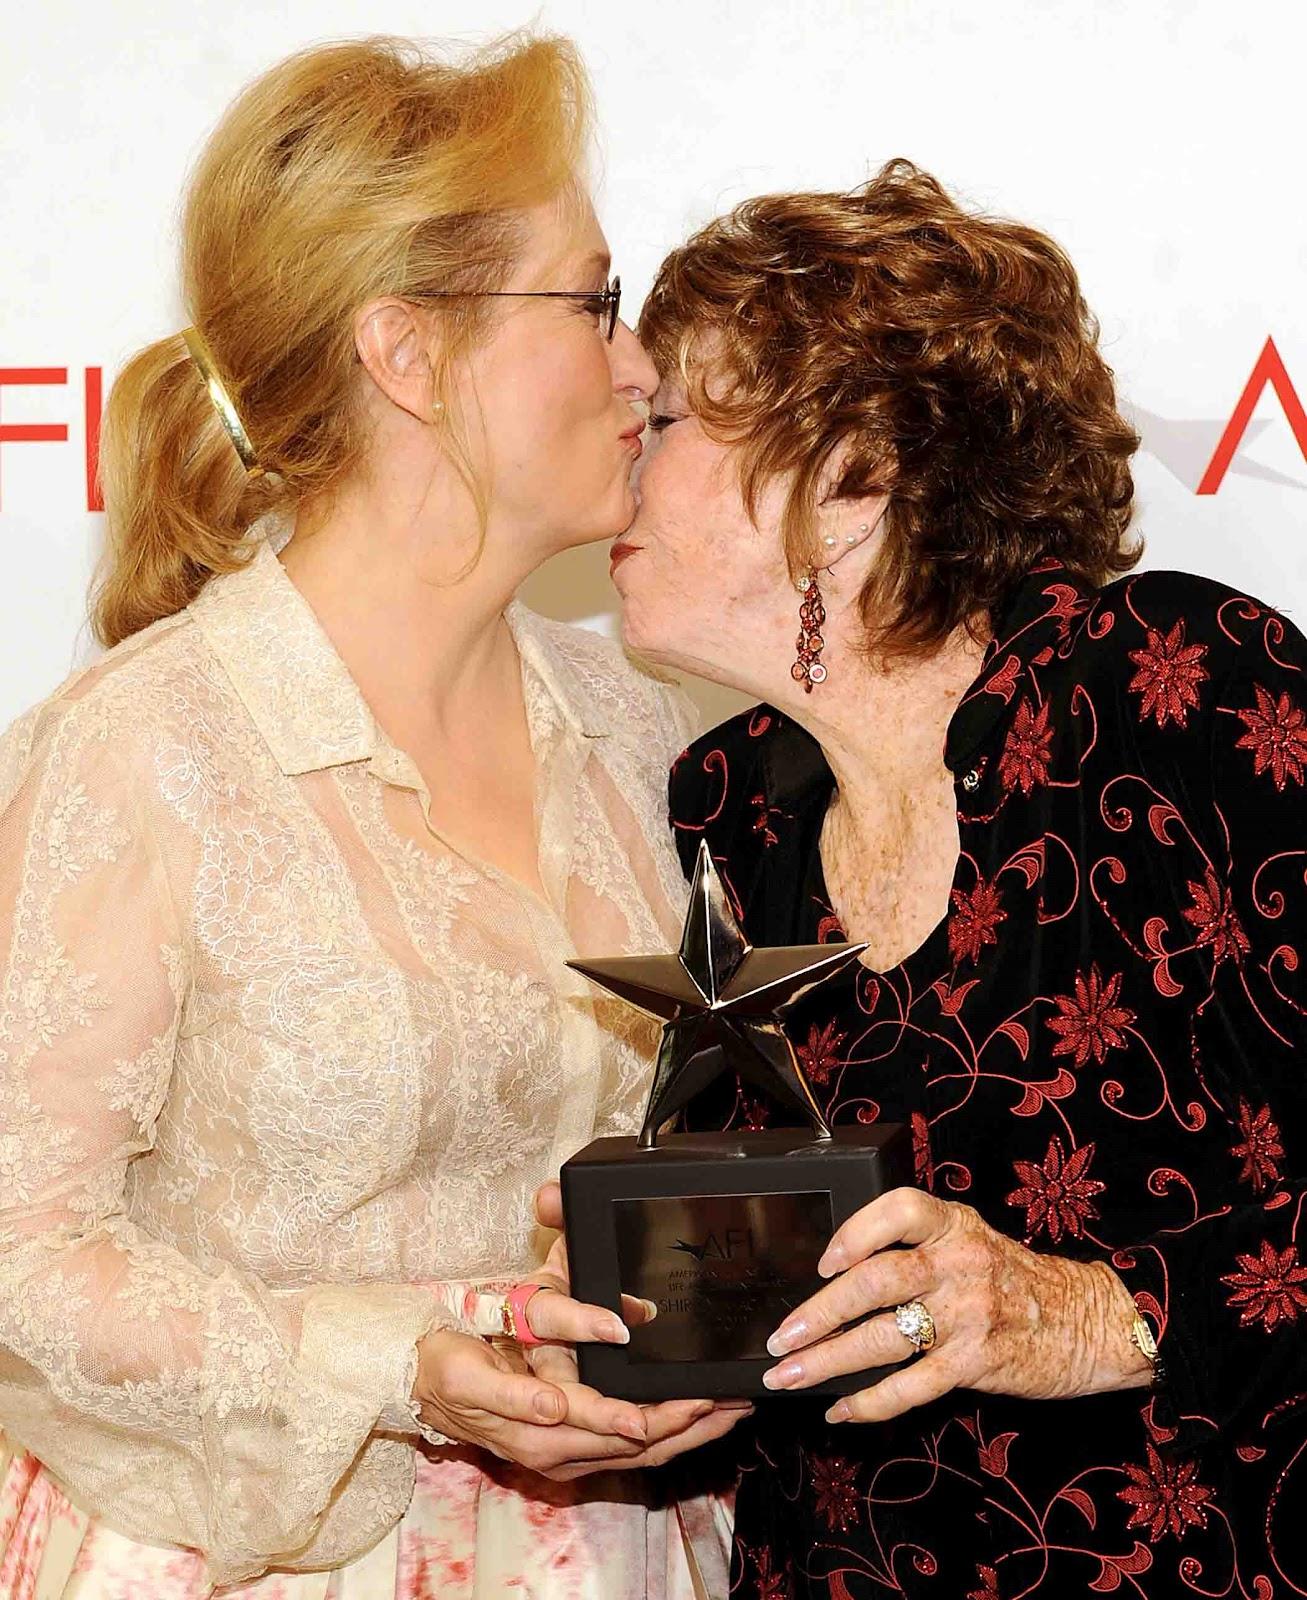 http://3.bp.blogspot.com/-YquSCqFa5zs/T9ThHz7pPVI/AAAAAAACdbA/PKo8bG8u6oA/s1600/Meryl+Streep+And+Shirley+MacLaine.jpg